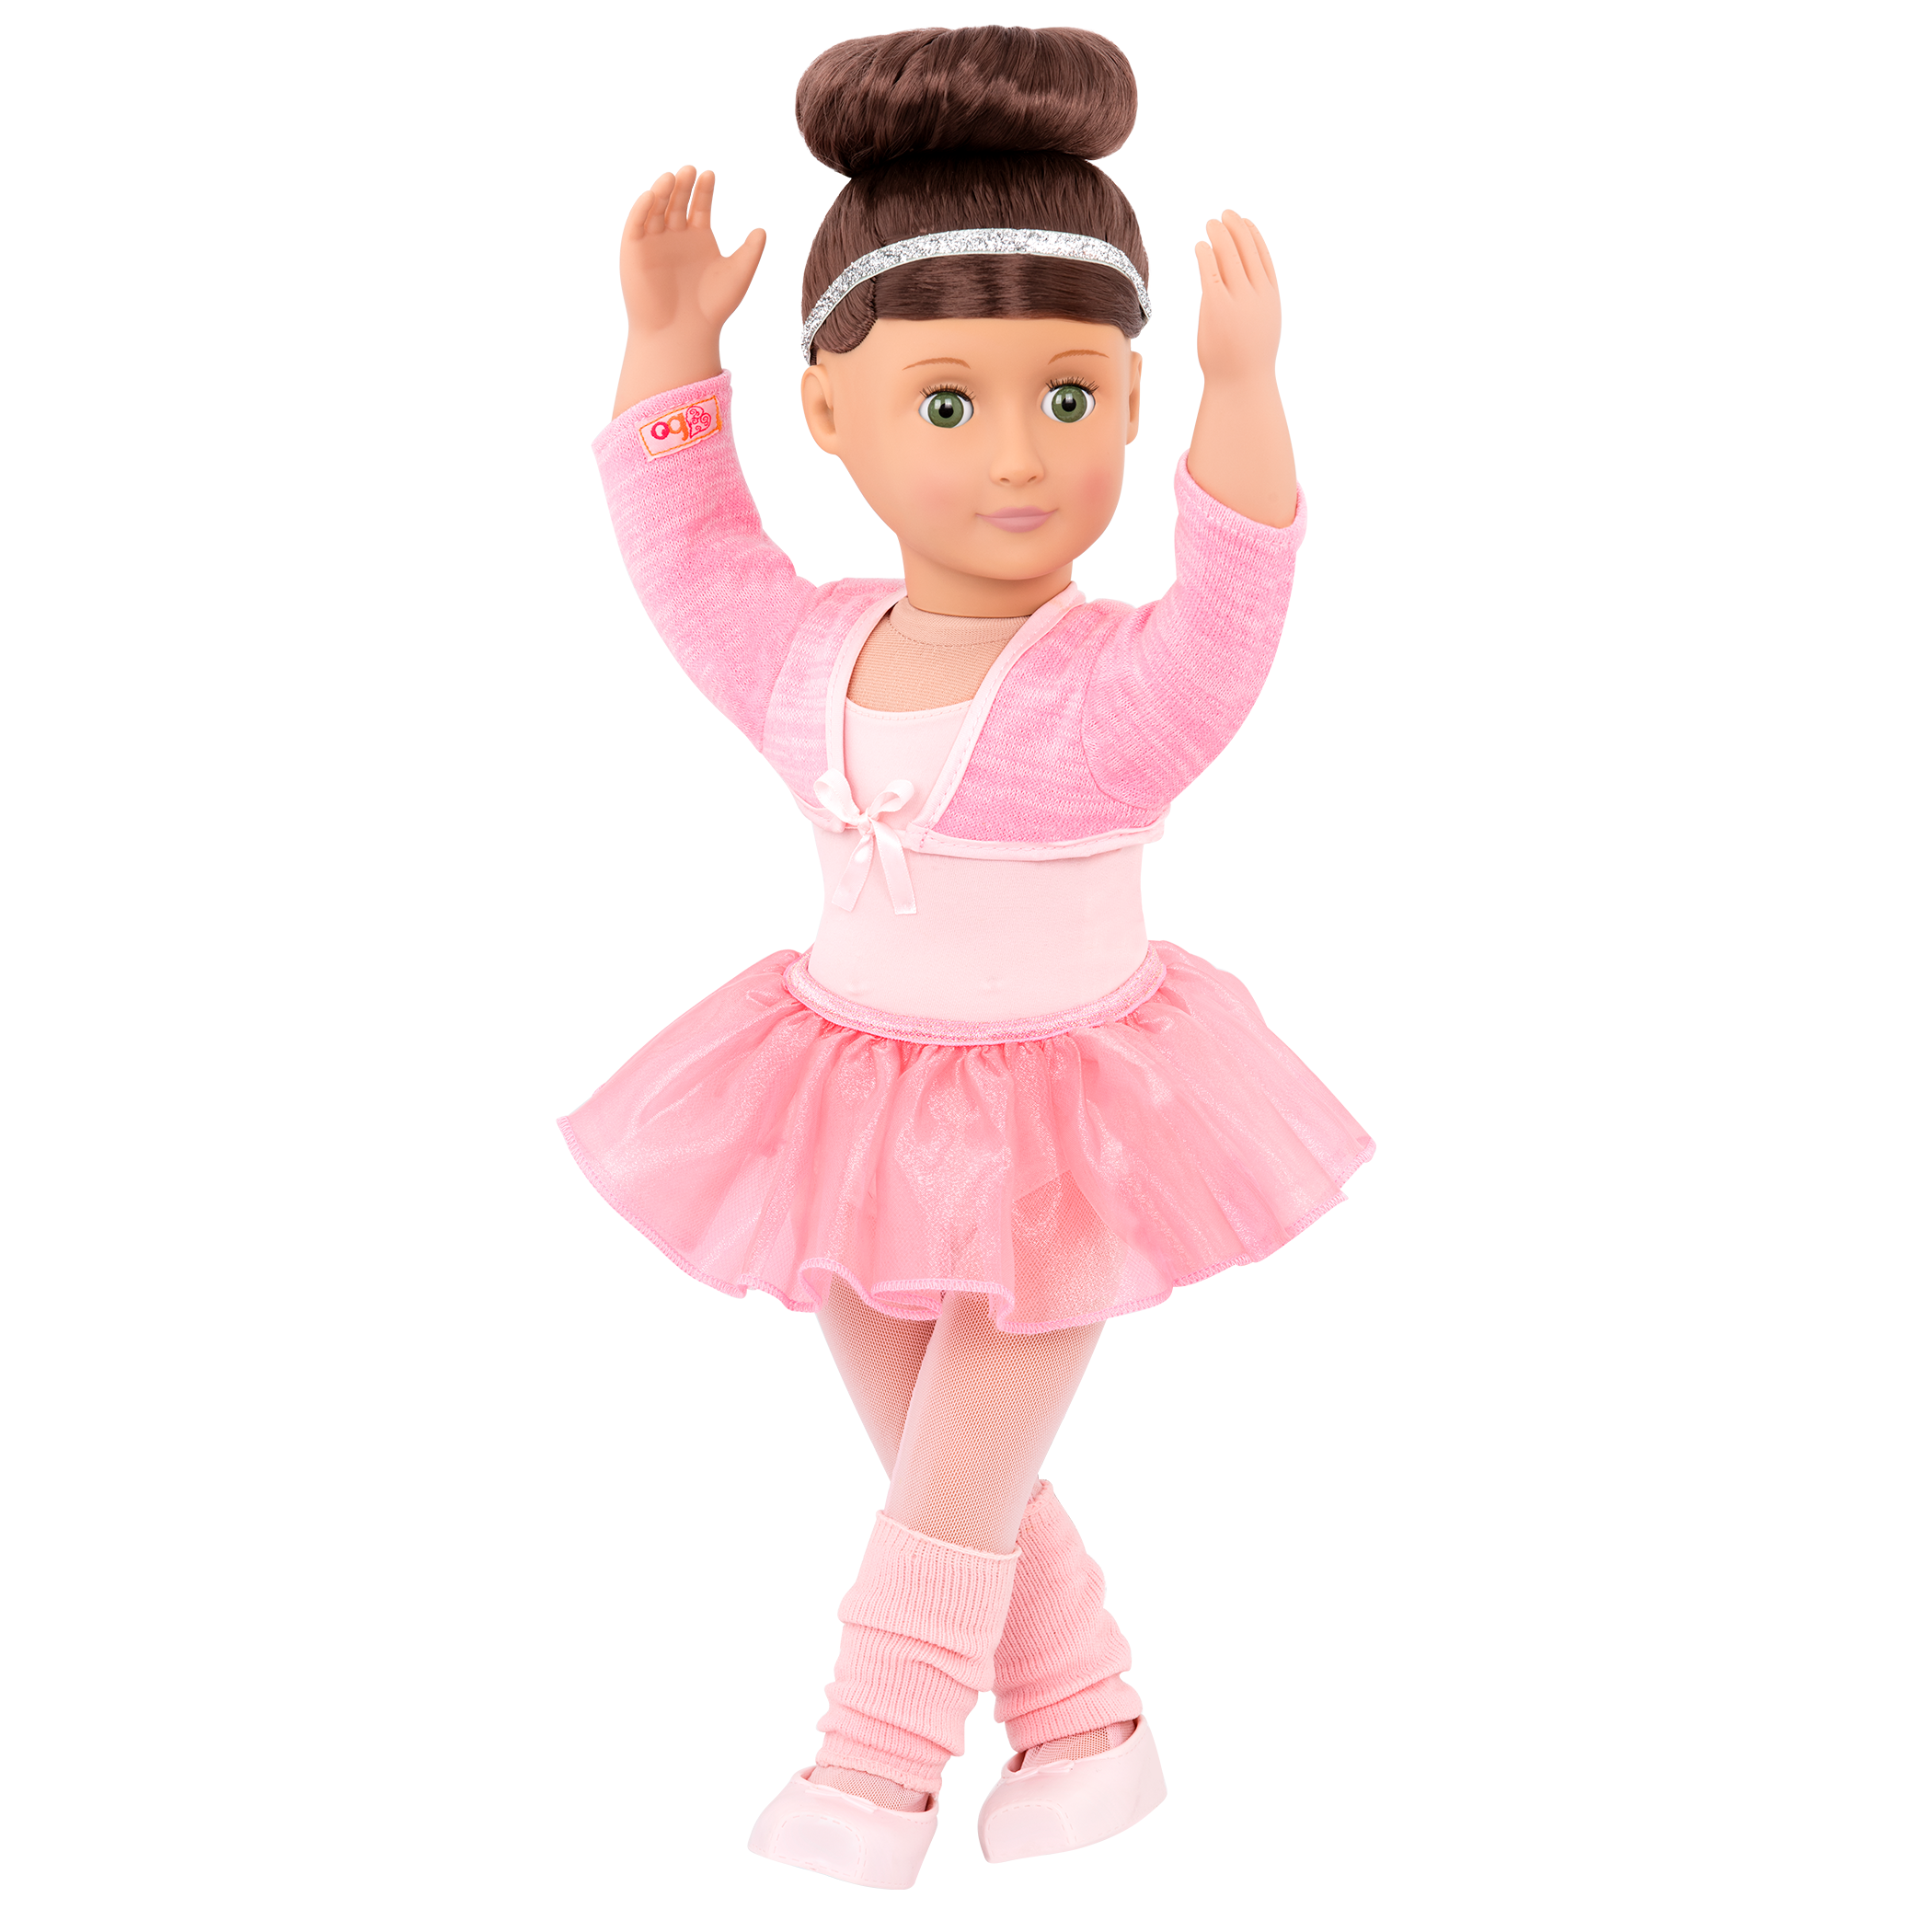 Our Generation 18-inch Ballerina Doll Sydney Lee